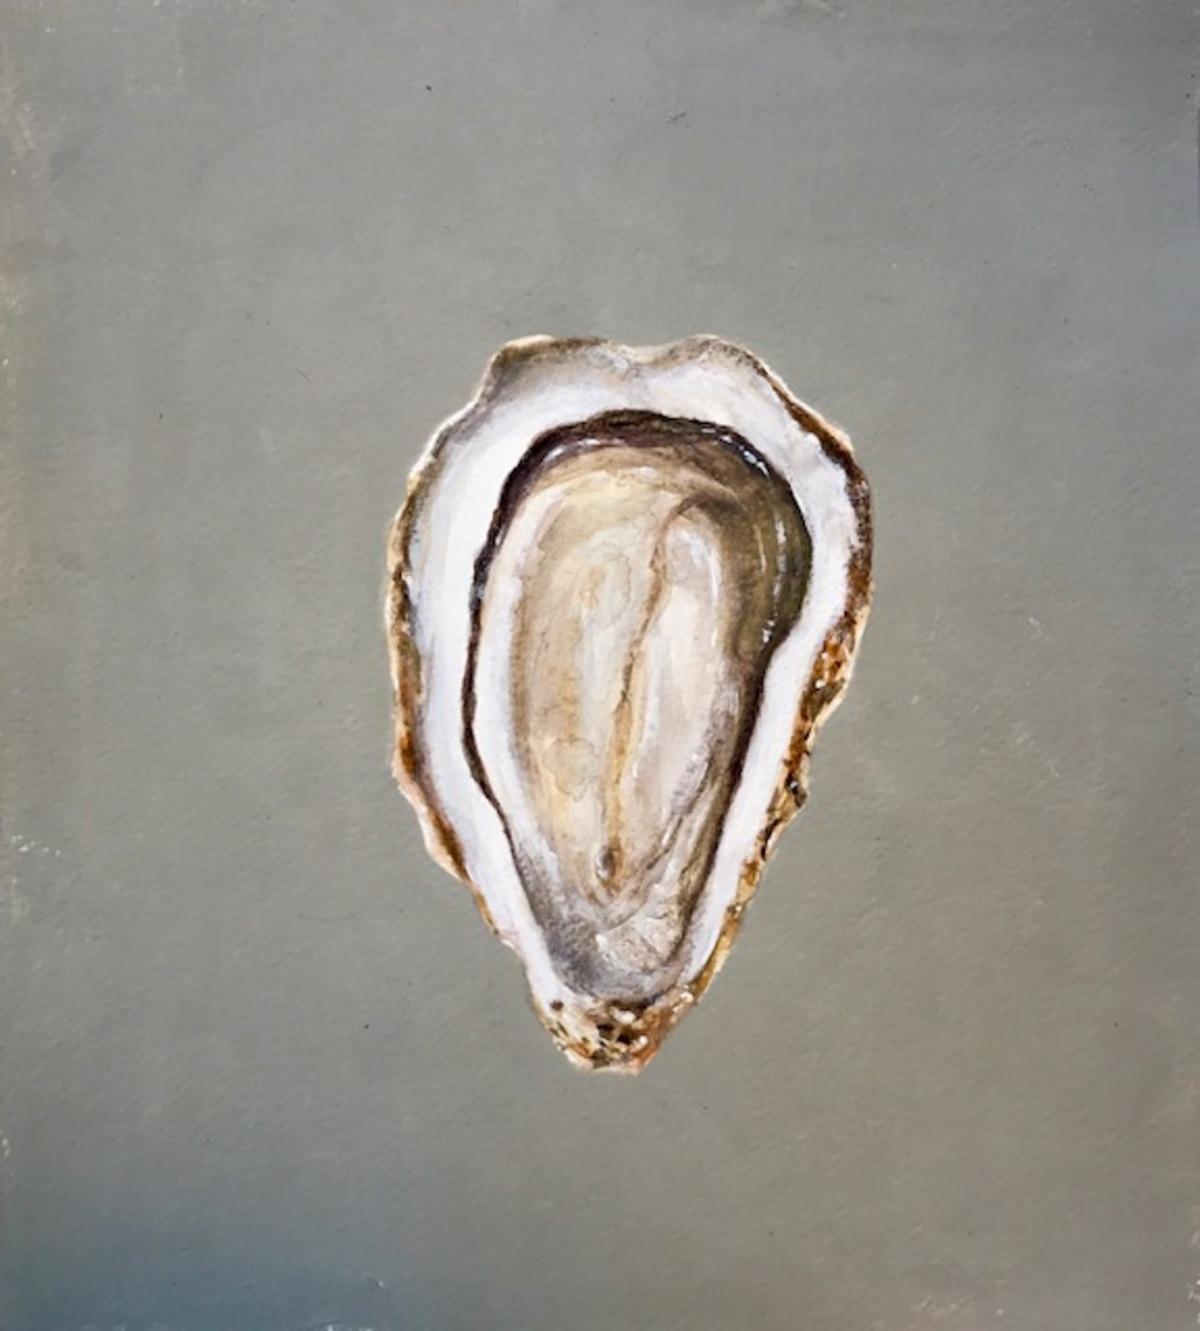 Breton oyster